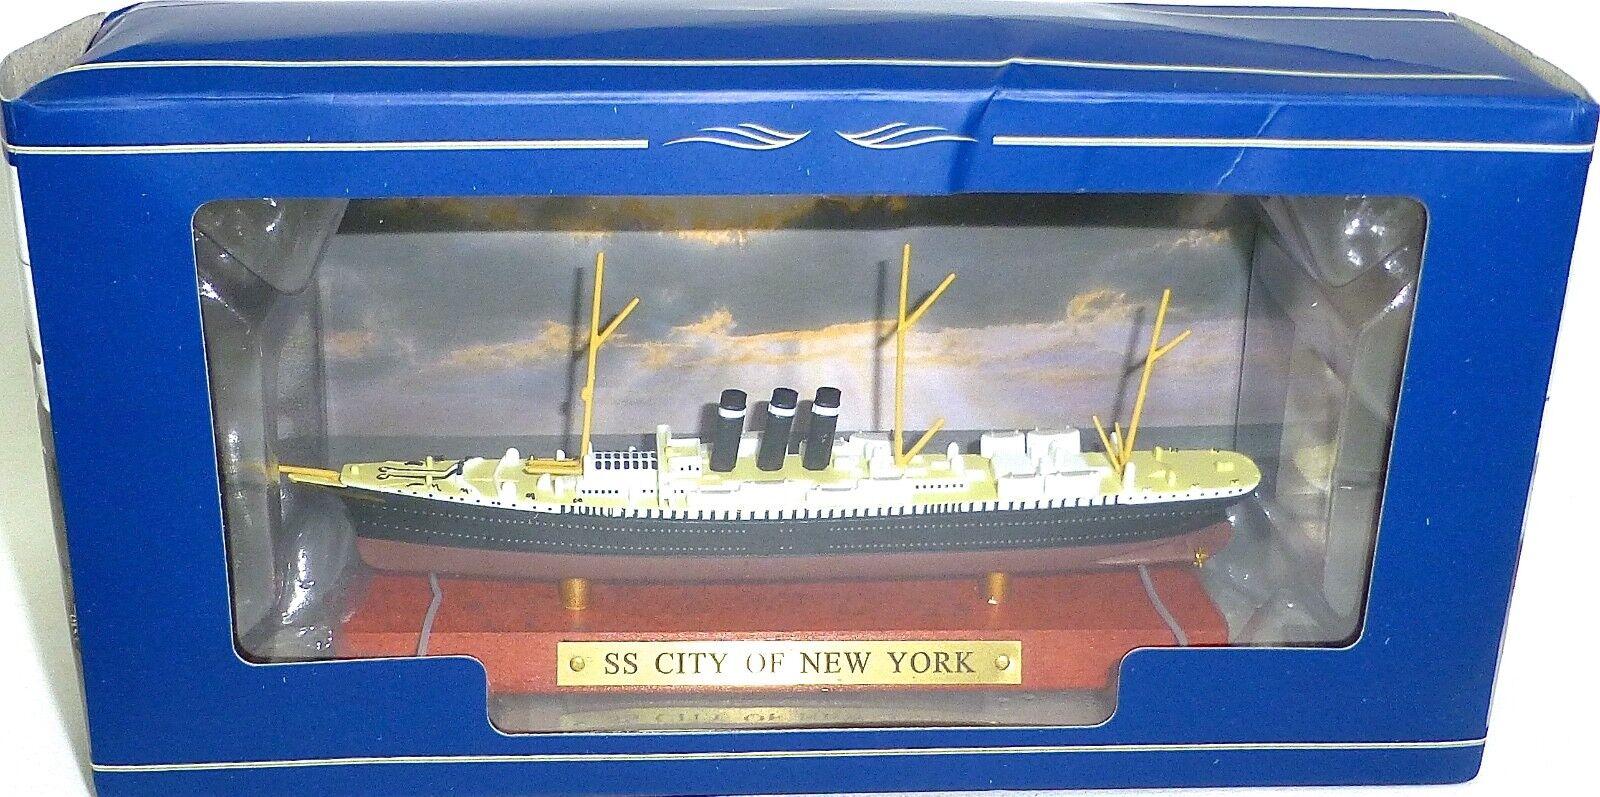 Ss Ville de New York Neuf en Boîte 1 1250 Emballage Scellé Atlas 7572011 UA1 Μ